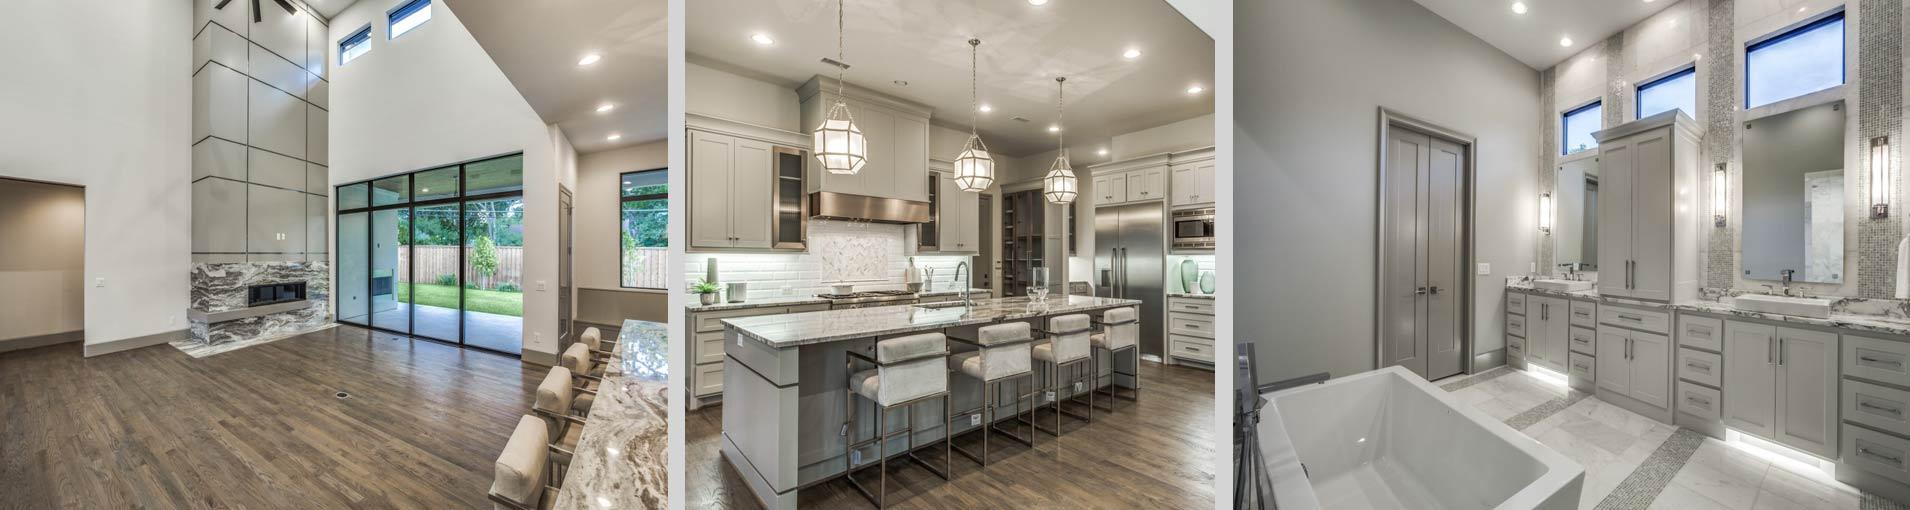 Preston Hollow Custom Home by Desco Fine Homes, Dallas, Texas Home Builder